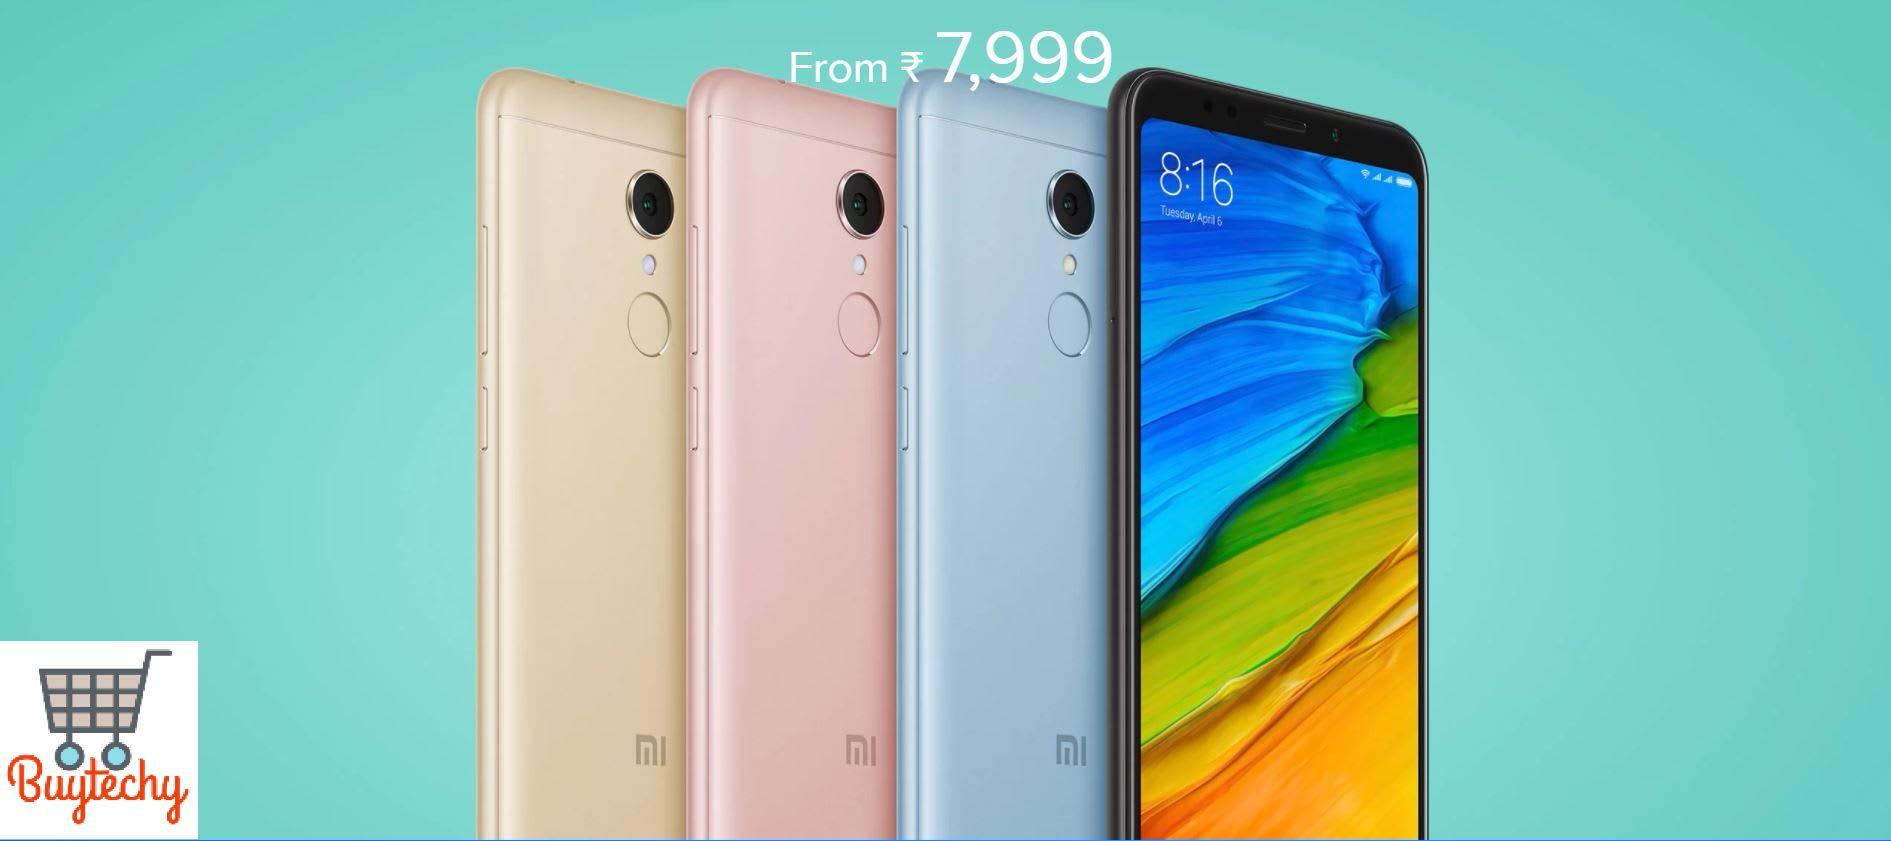 Buy Xiaomi Redmi 5 Launch New Smartphone in Budget